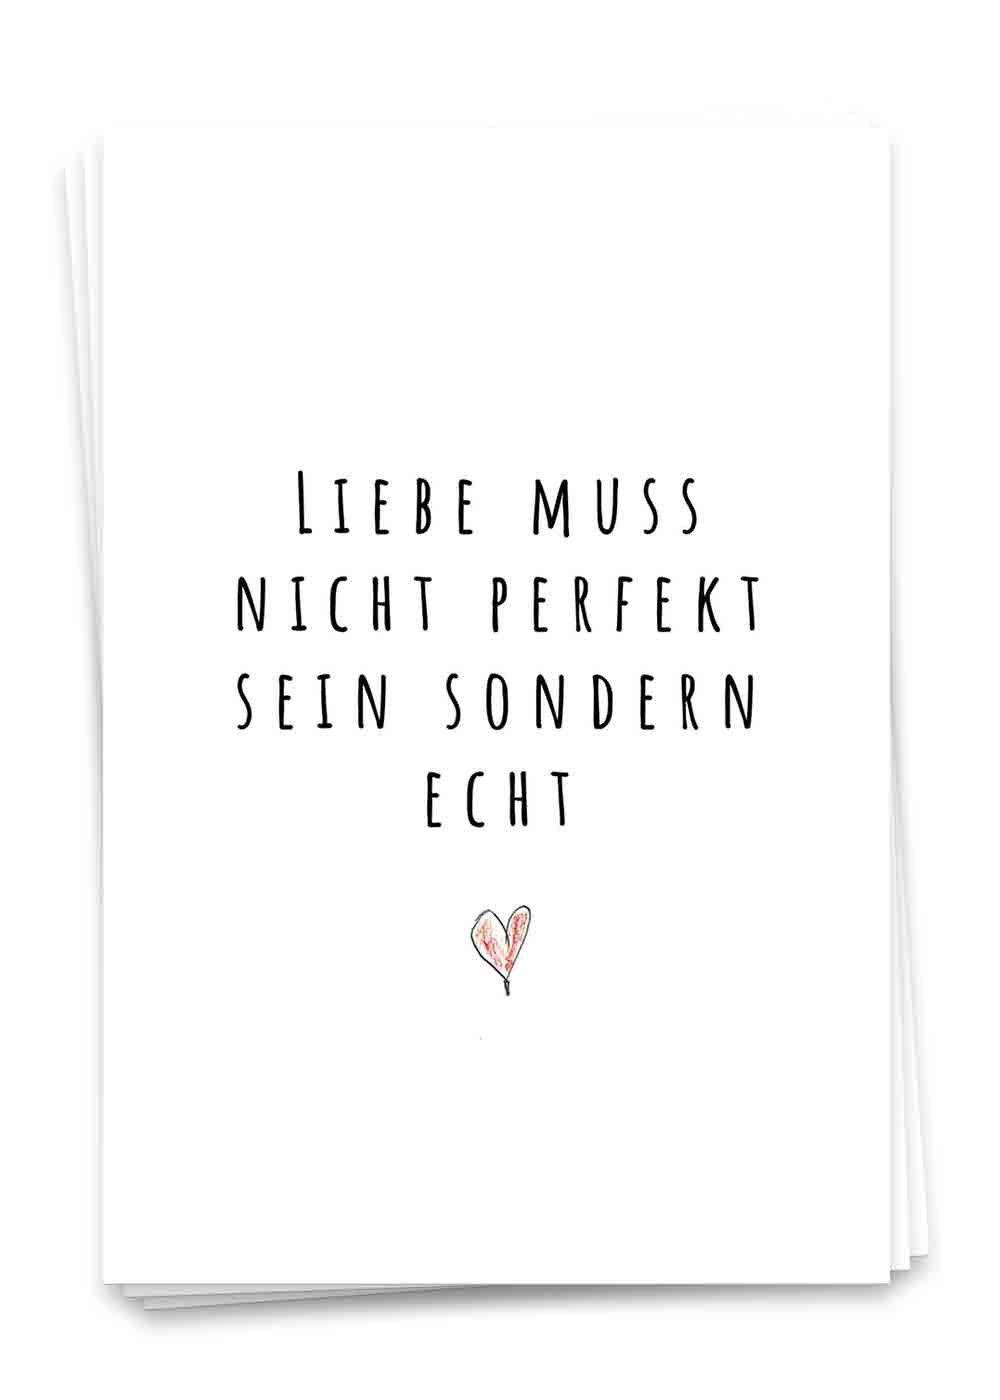 liebe muss nicht perfekt sein sondern echt zitat